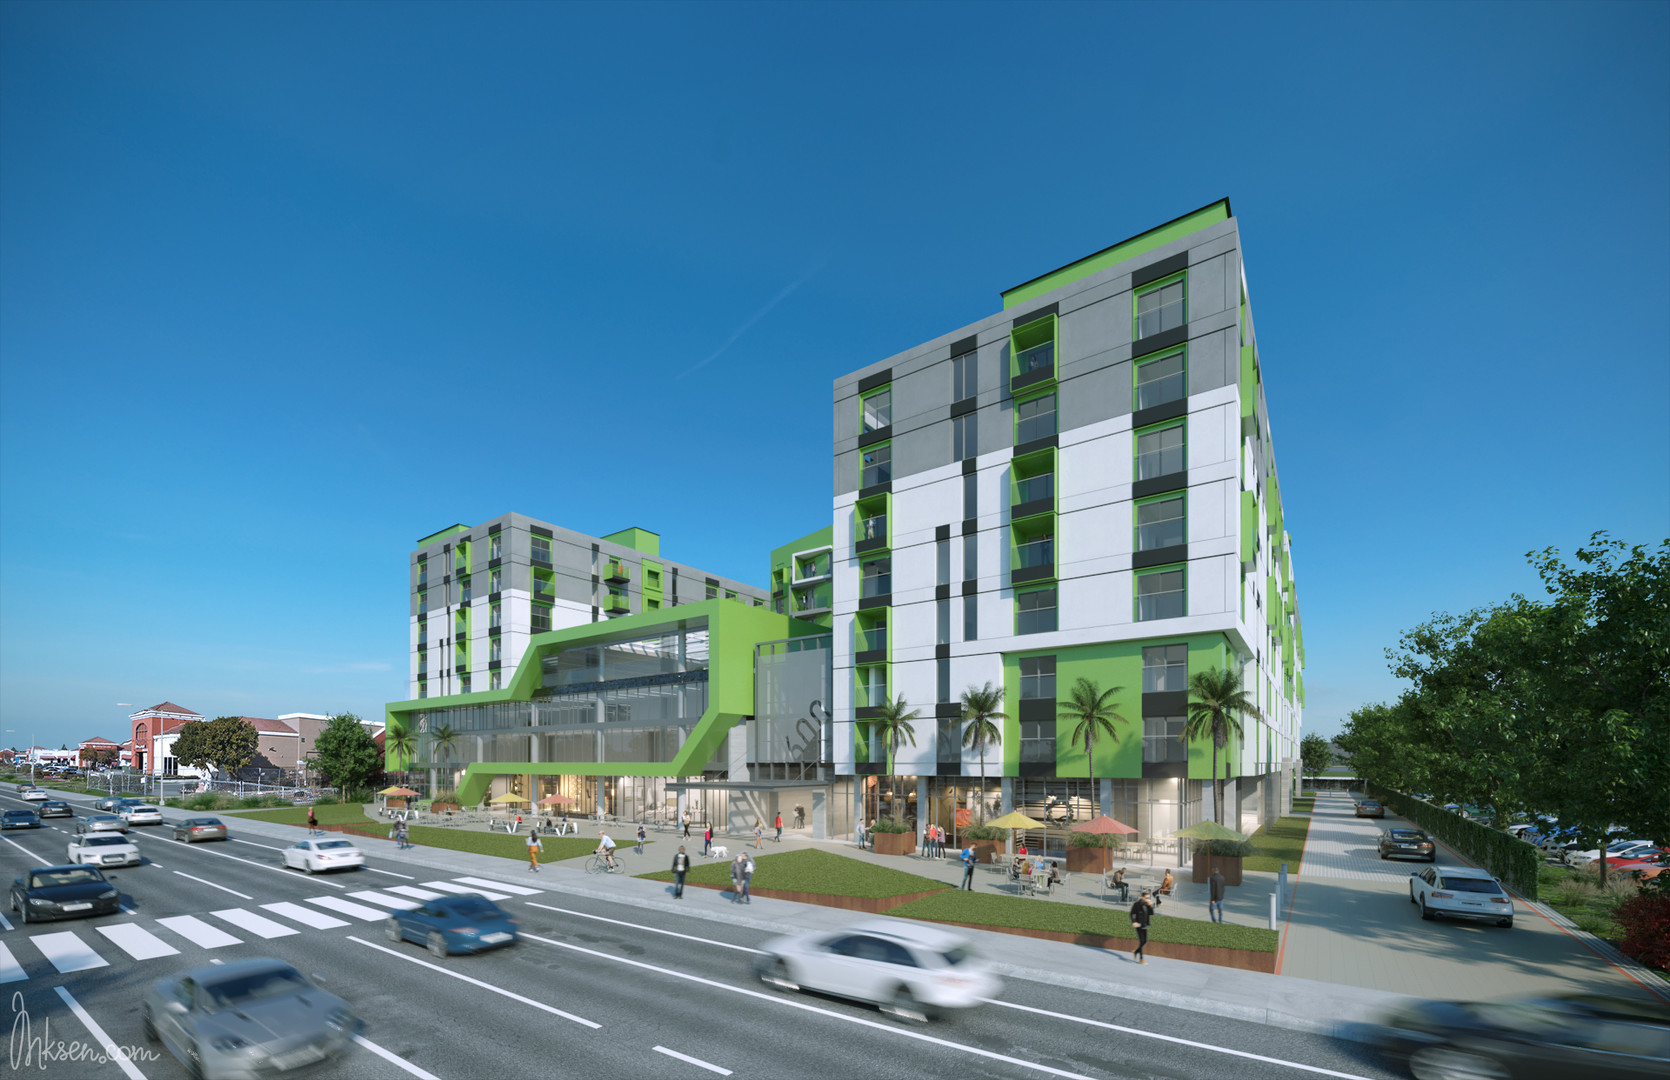 600 Barber Lane, Milpitas, California  Created for: